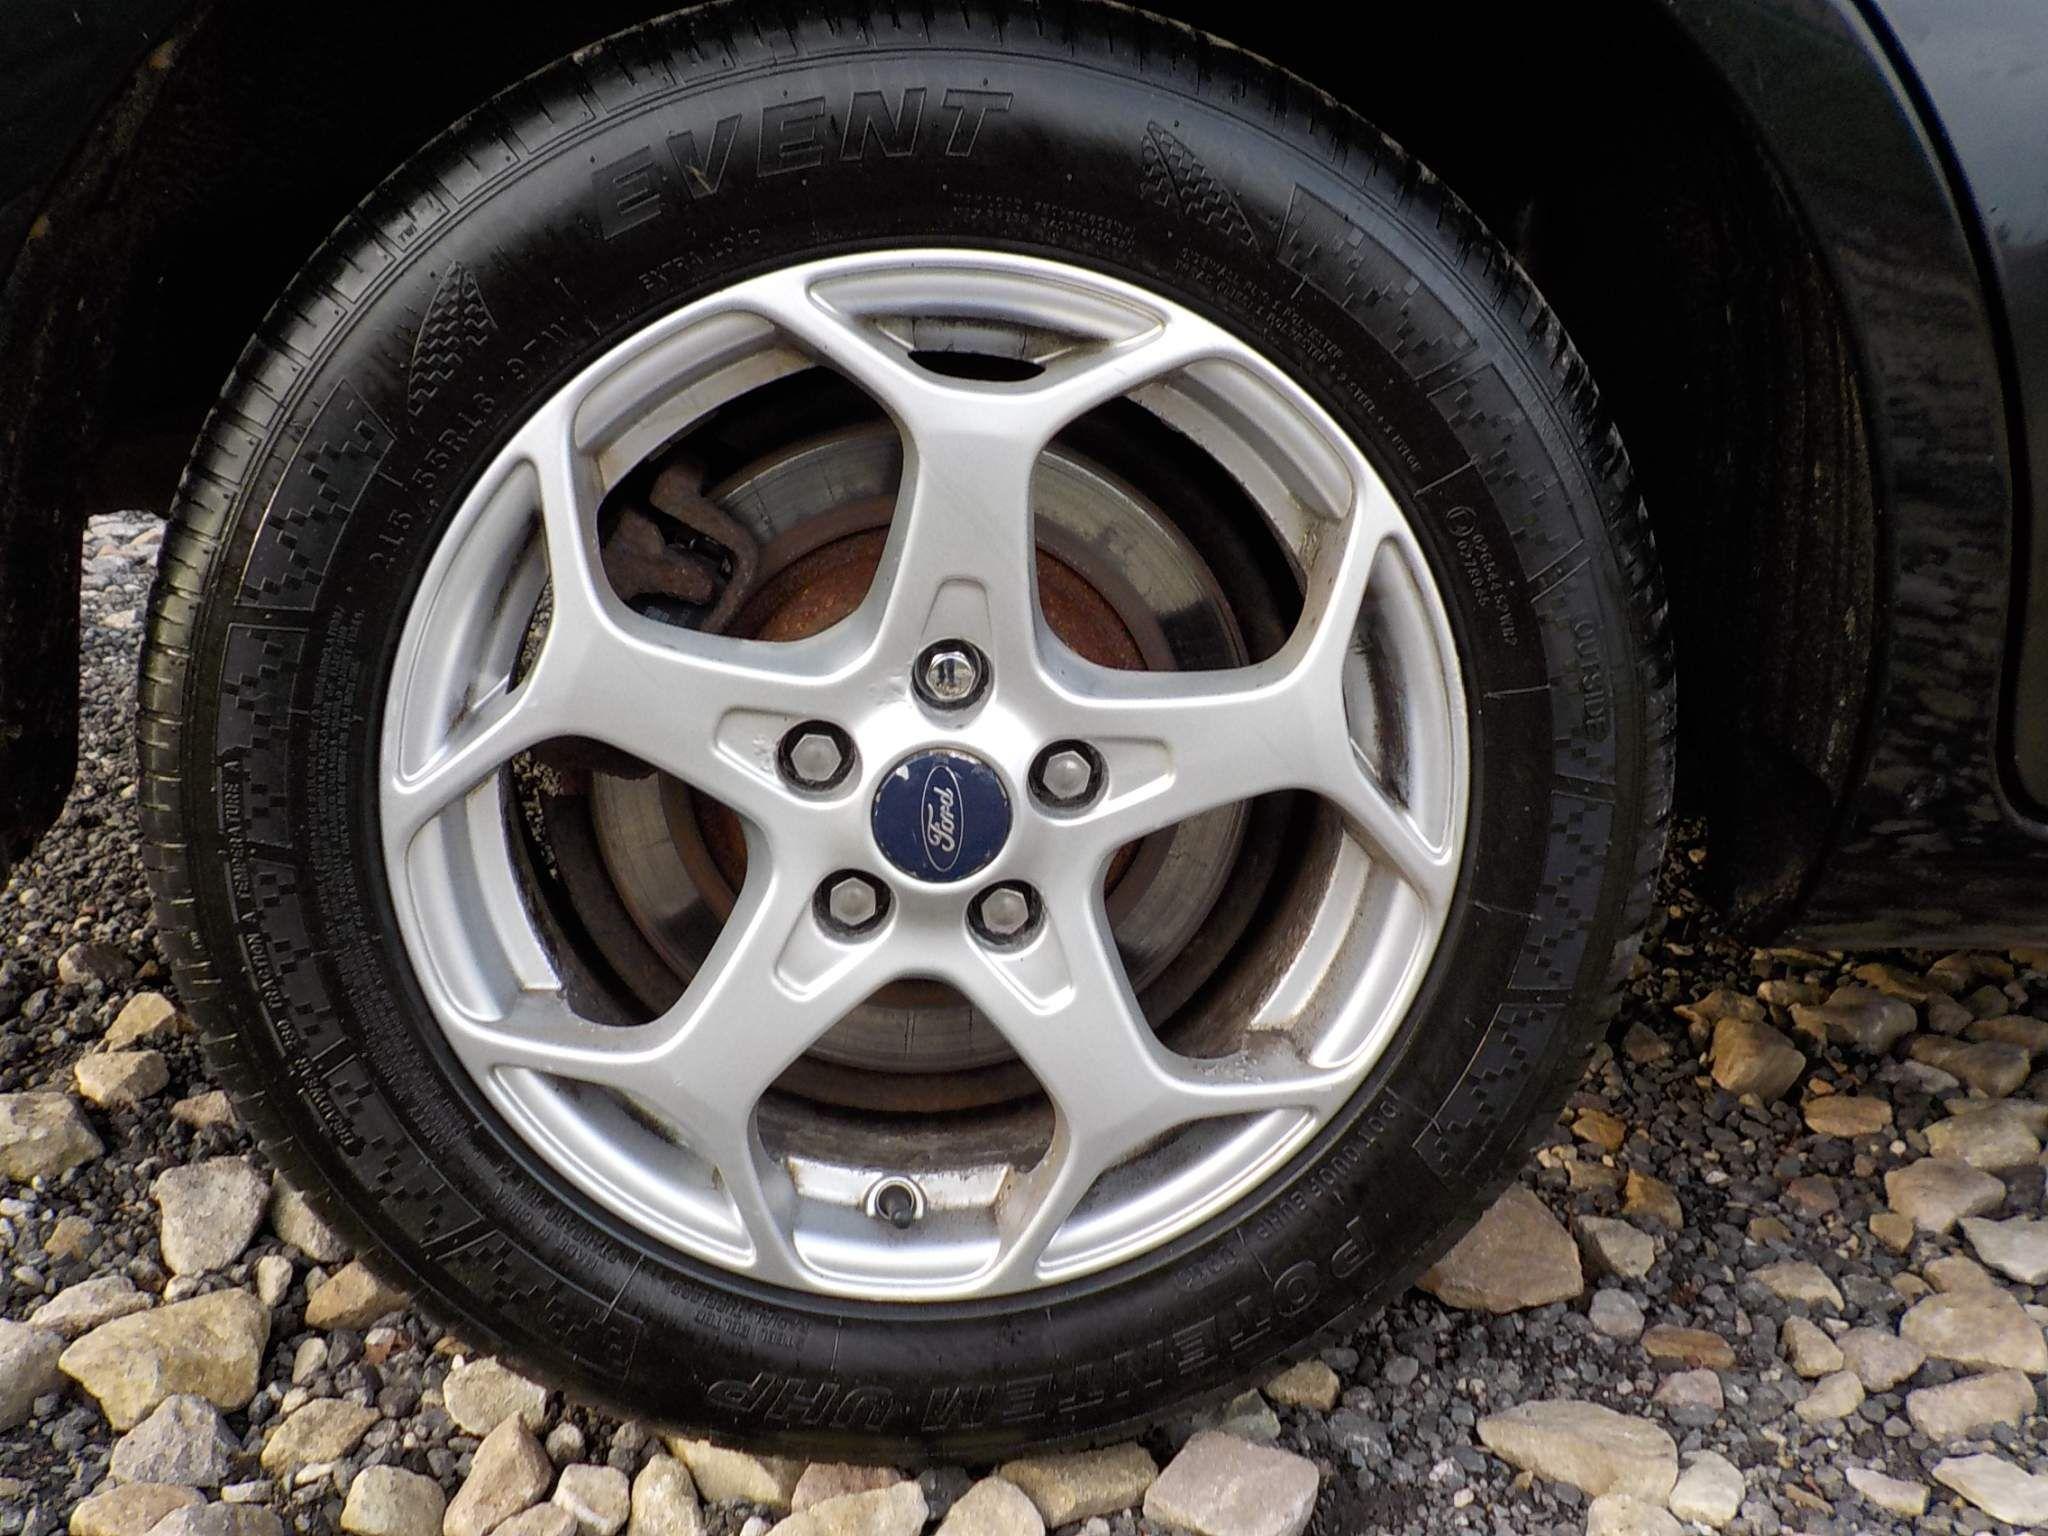 Ford Mondeo 1.8 TDCi Zetec 5dr